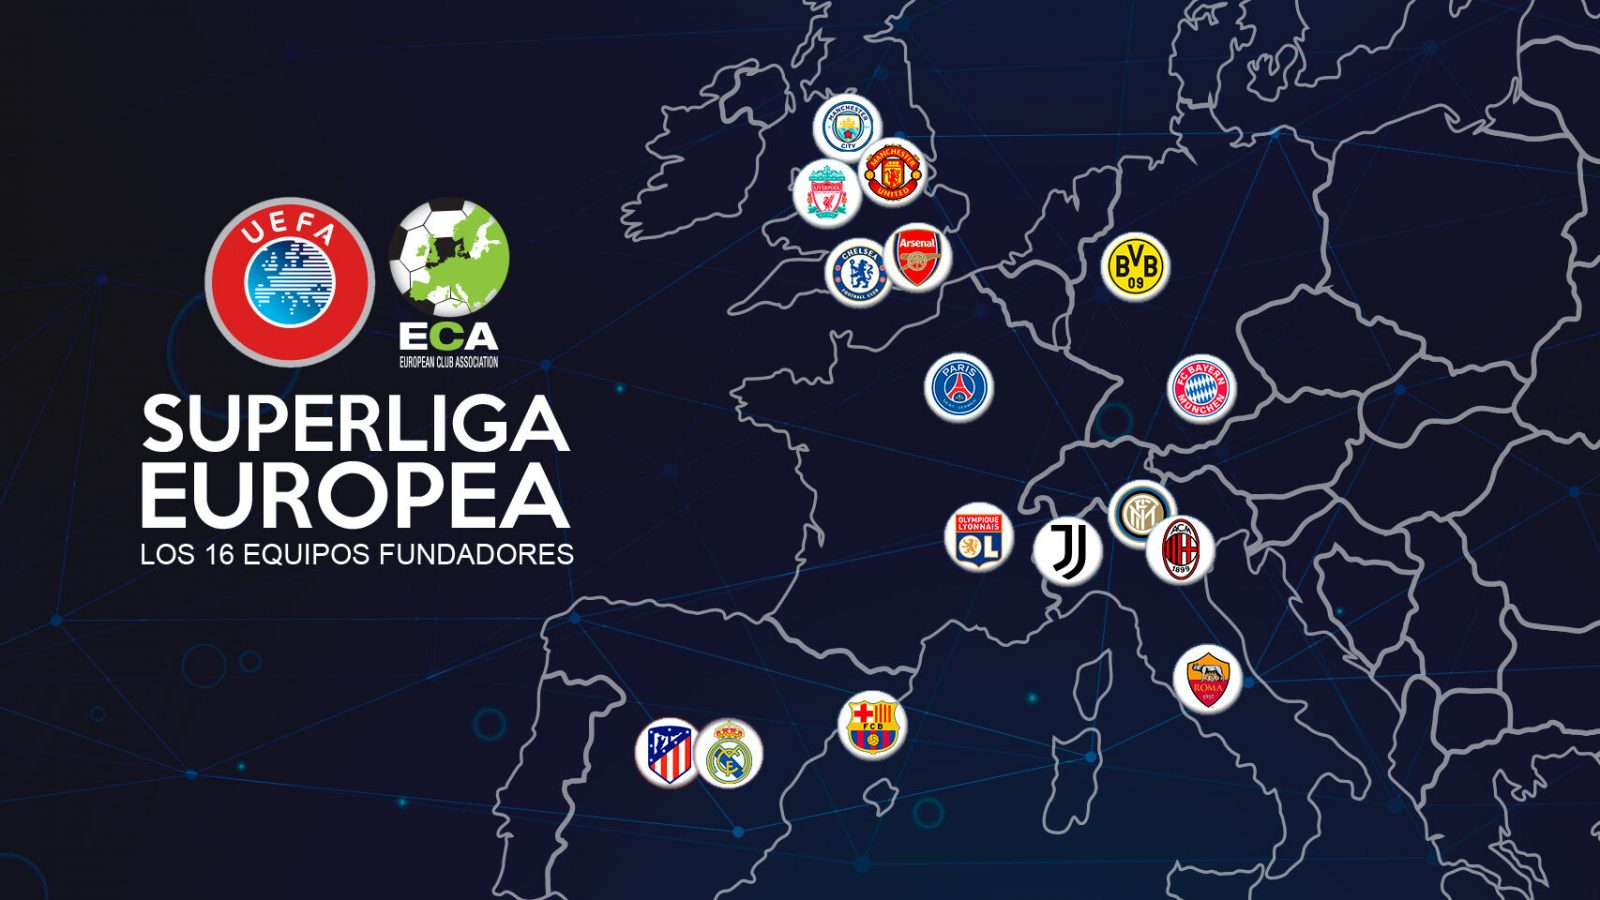 Equipos ingleses quieren romper la Champions League con dinero americano